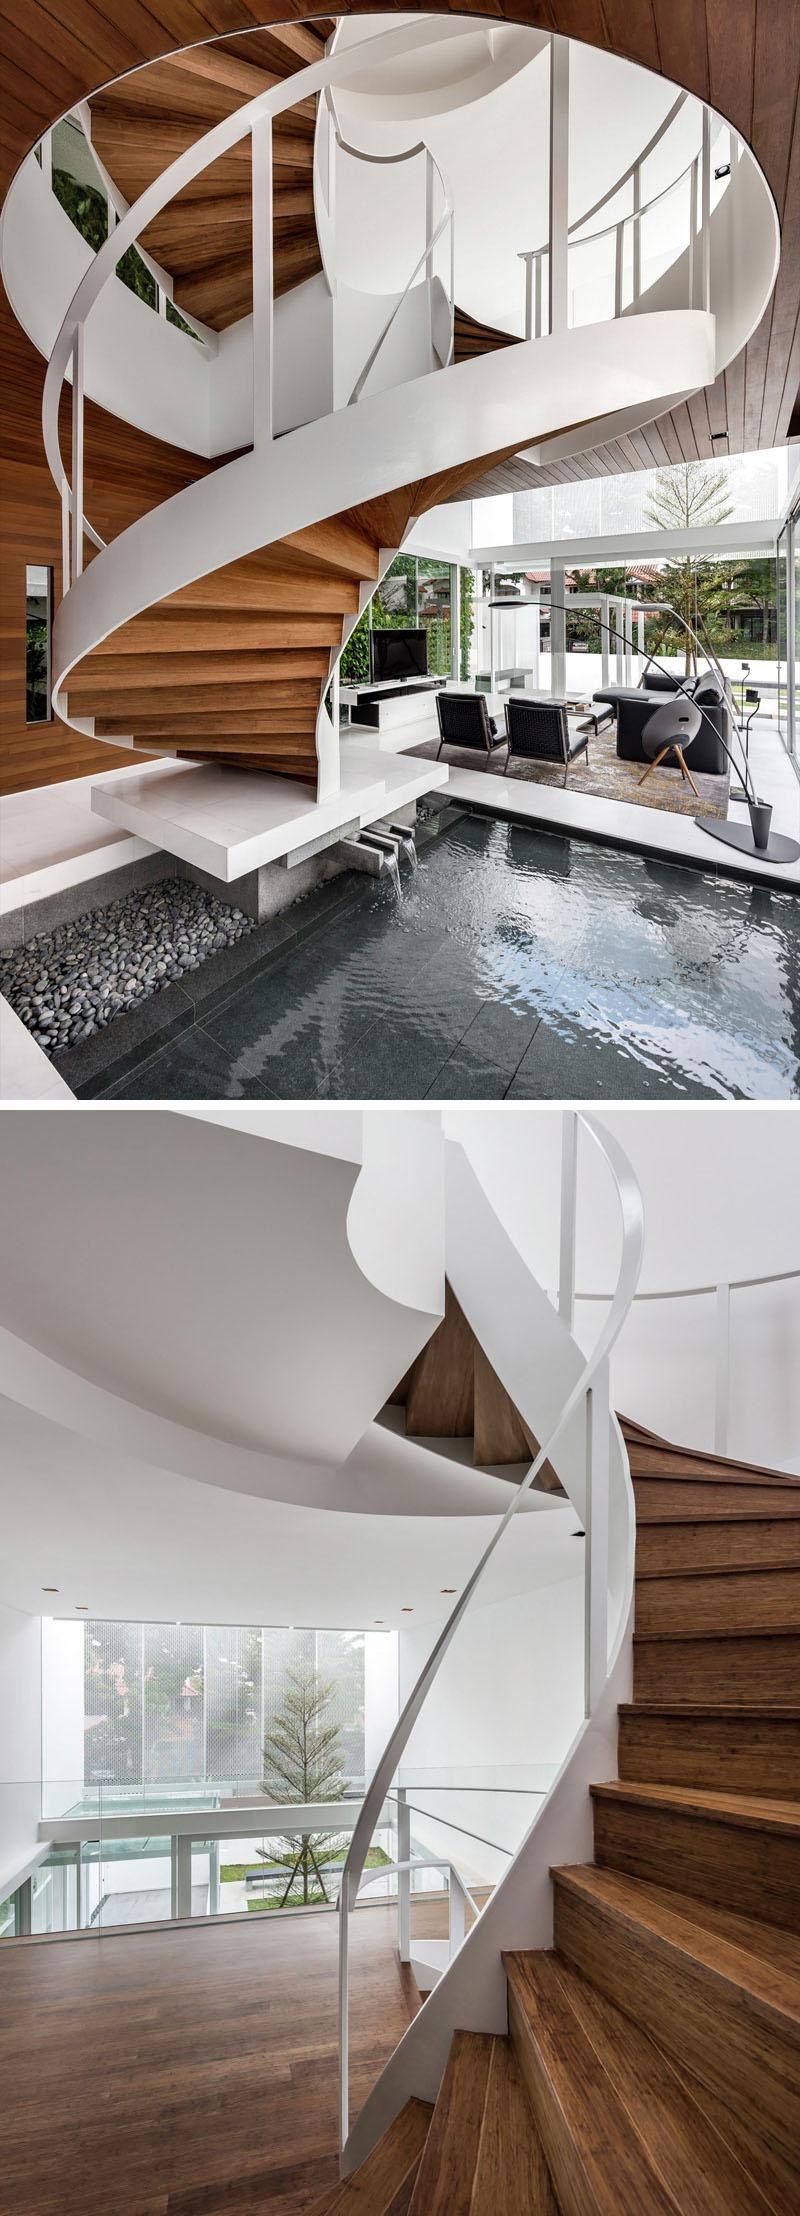 White metal handrail